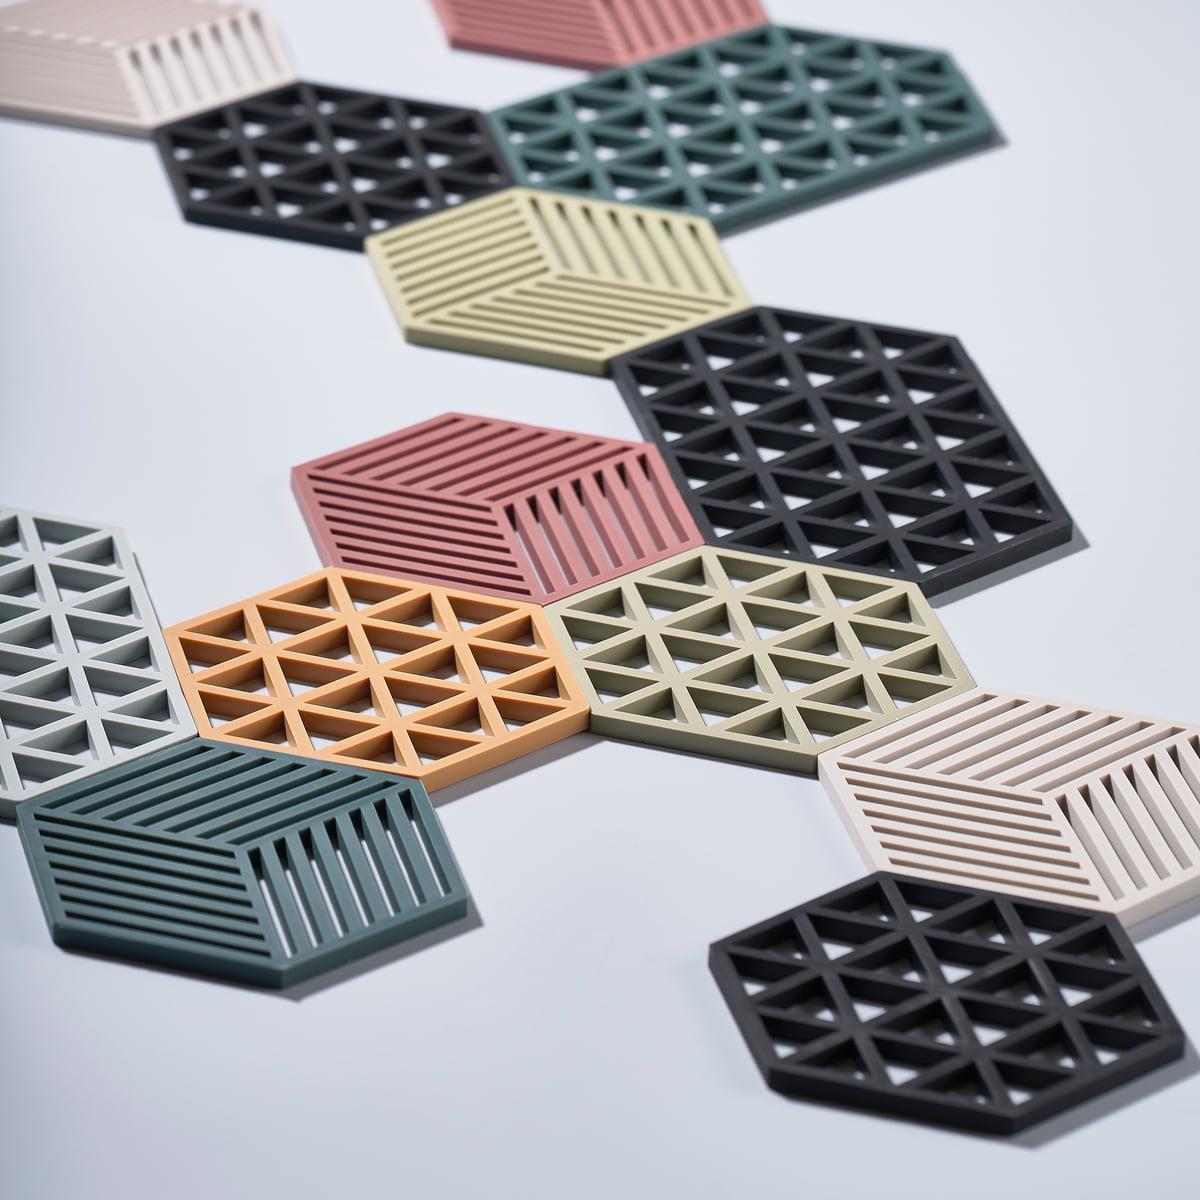 Dessous de Plat Design Triangles Silicone Gris Zone Denmark cadeau ...